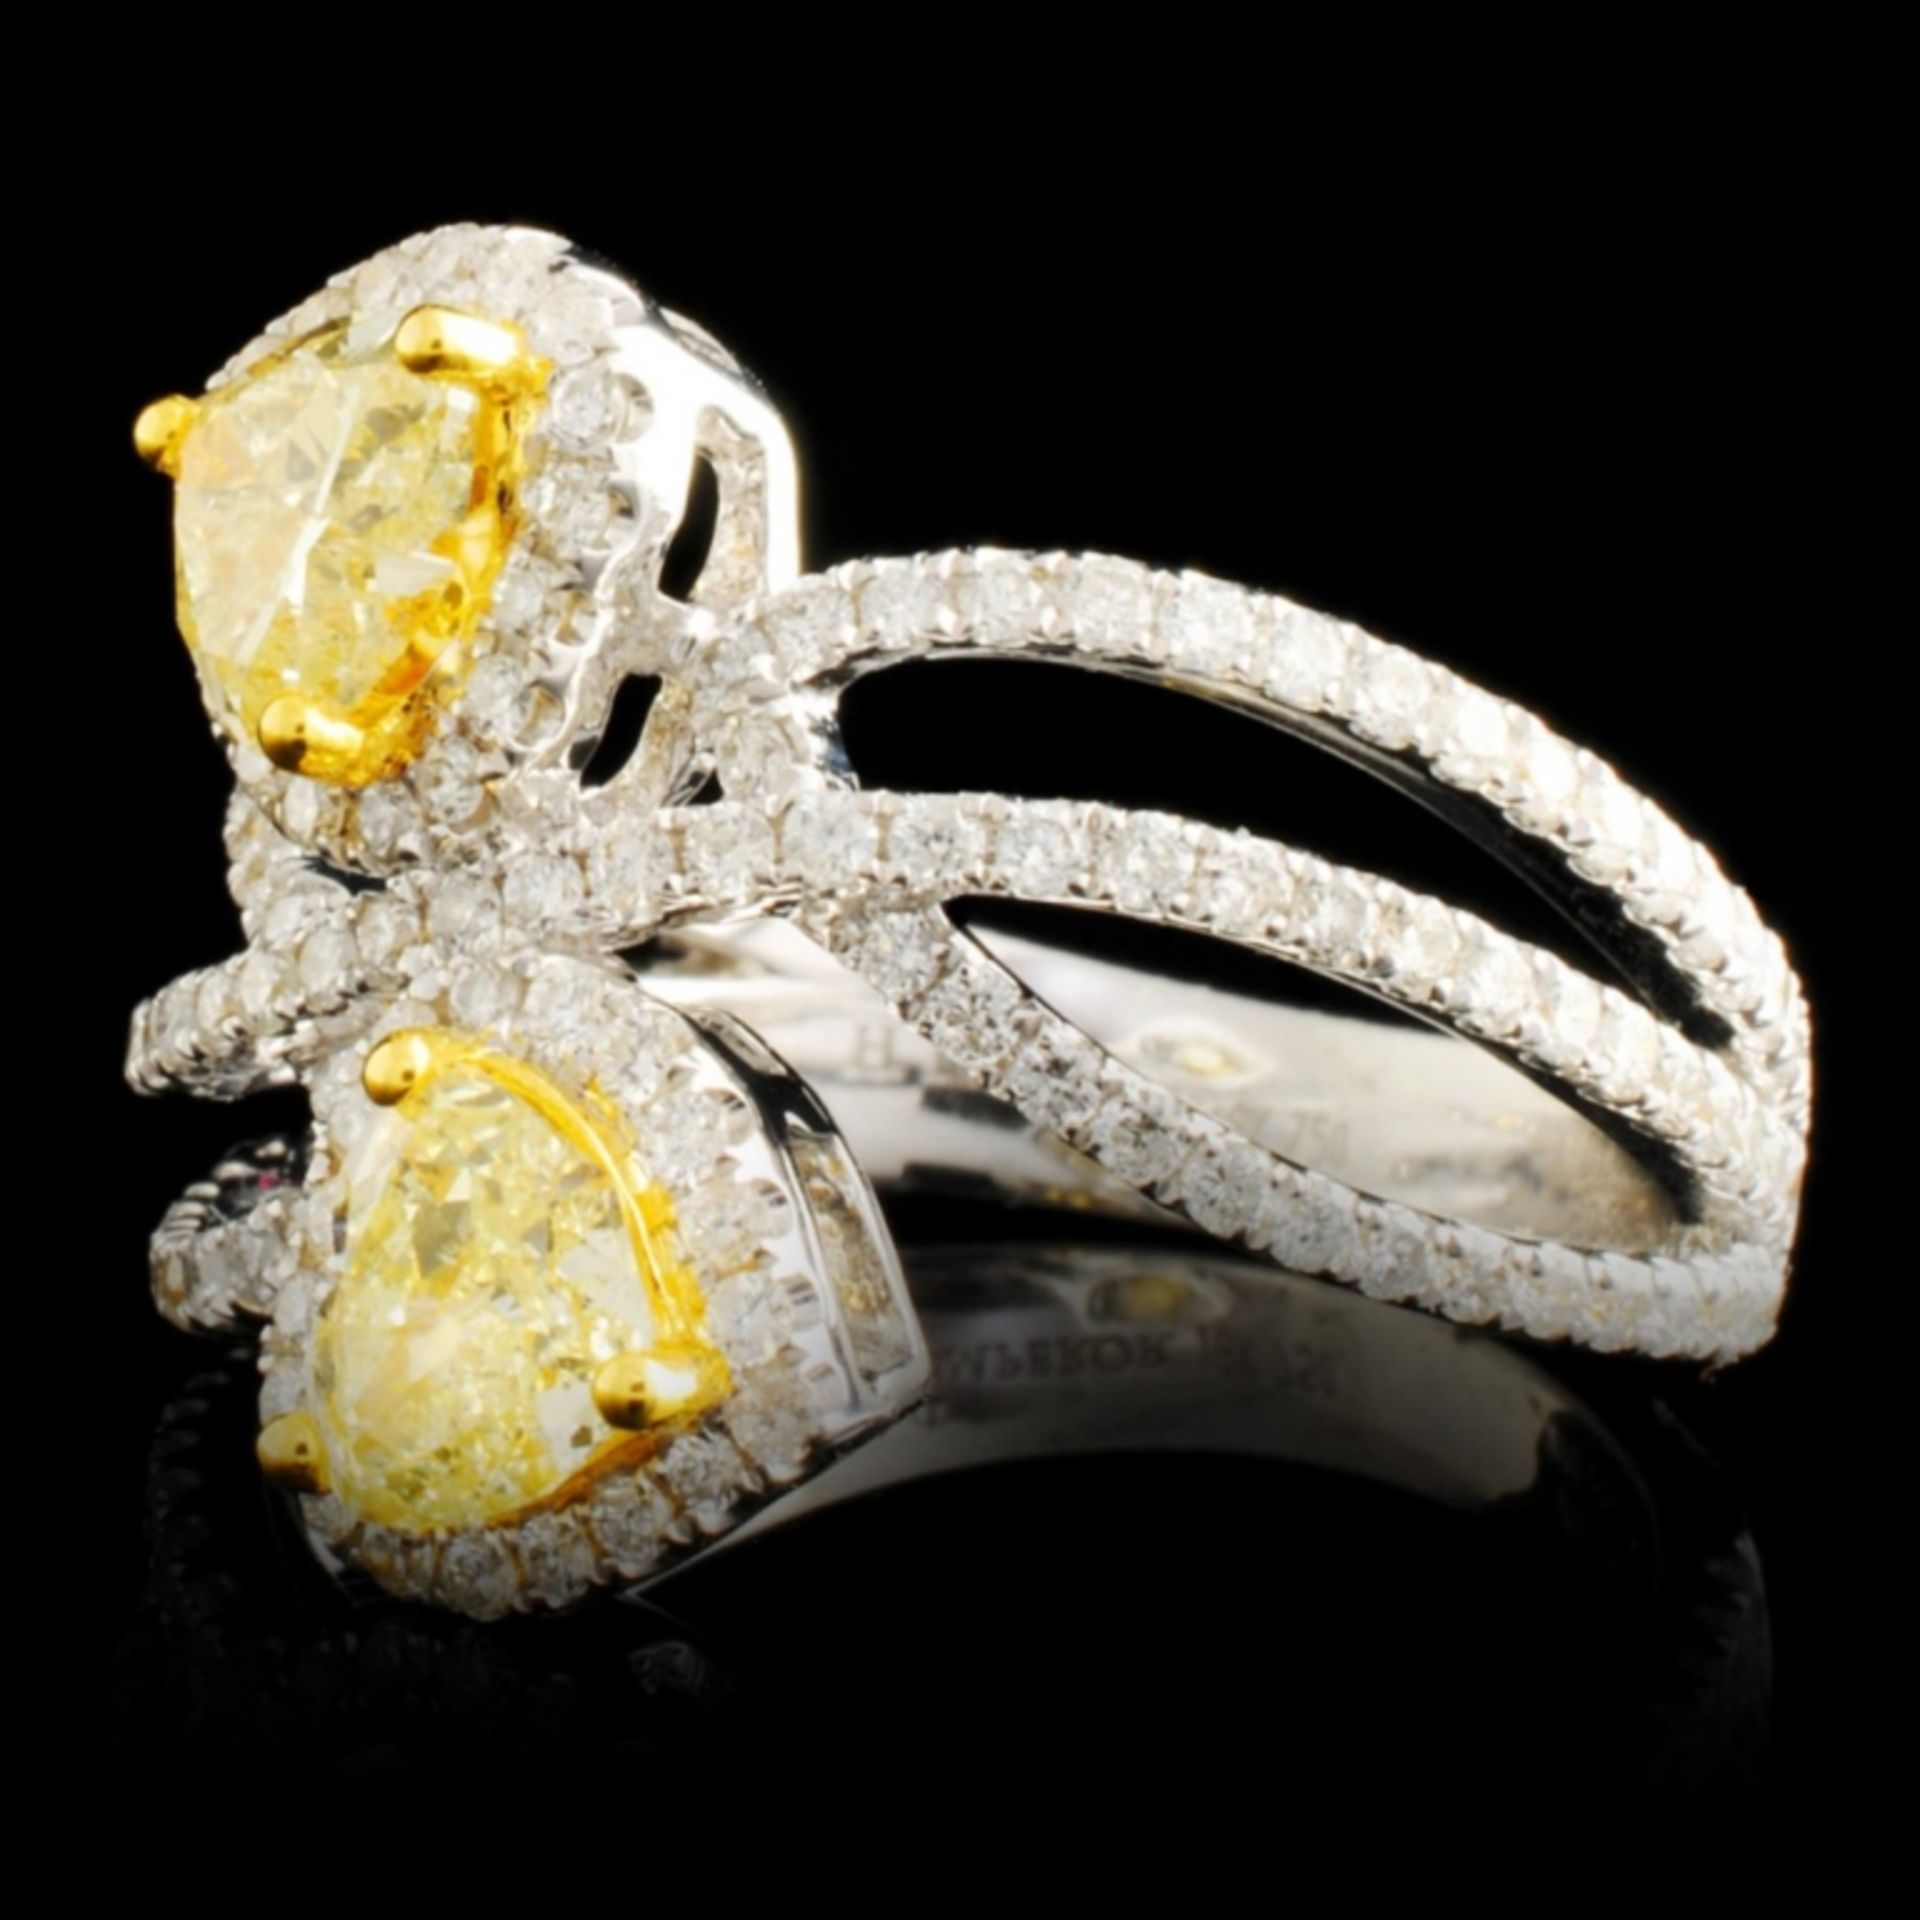 18K Gold 1.96ctw Diamond Ring - Image 2 of 5